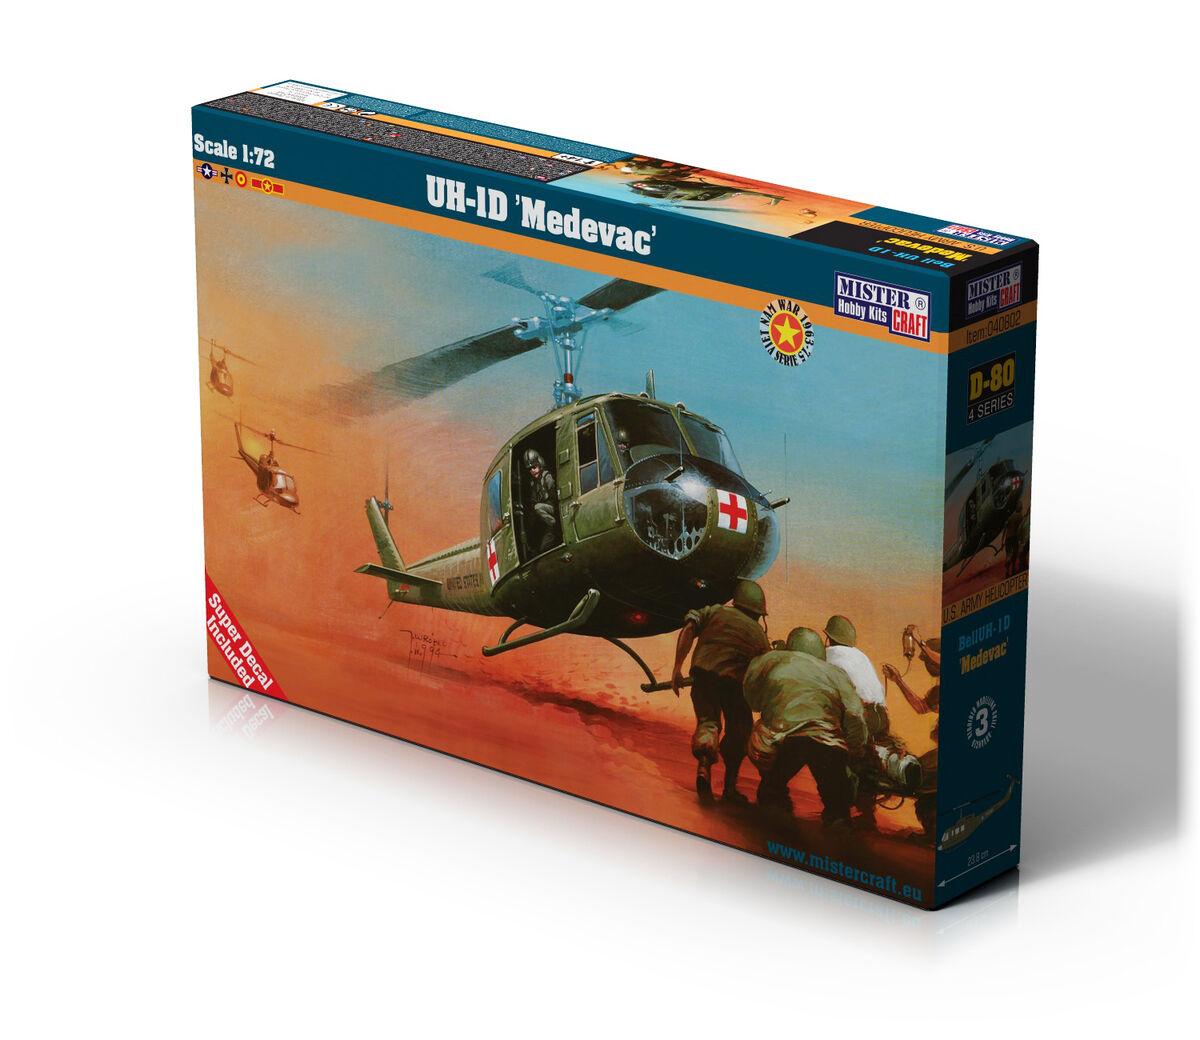 UH-1D Medevac - Image 1